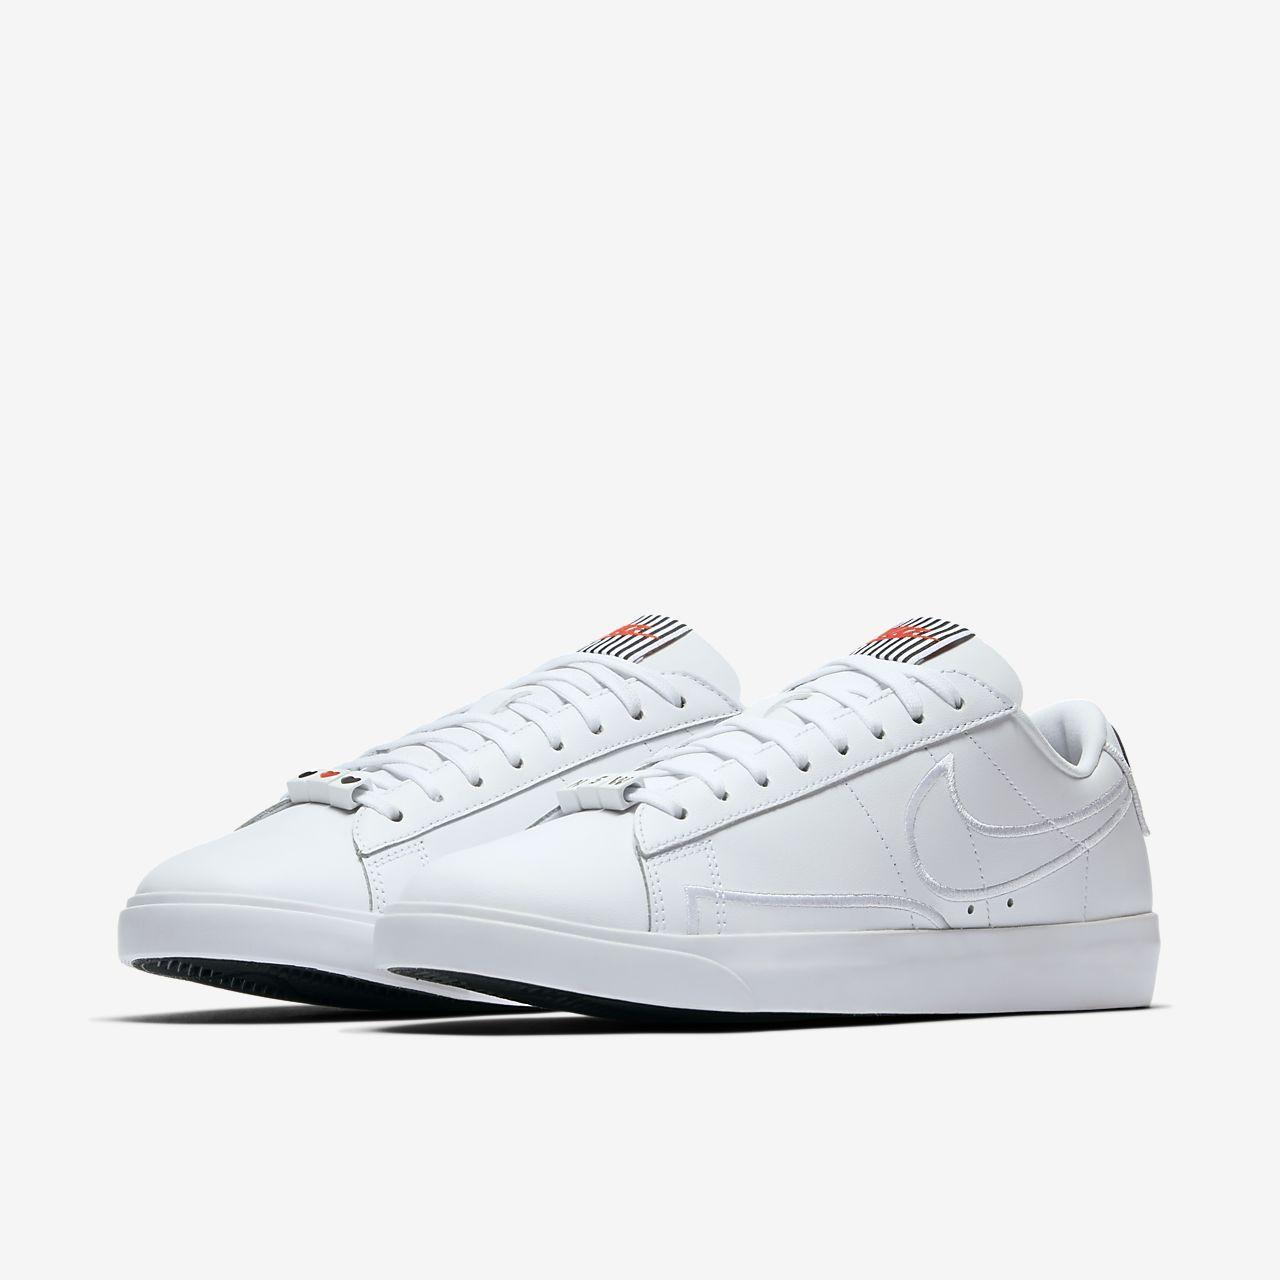 6f28096565e Nike Blazer Low SE LX Women s Shoe